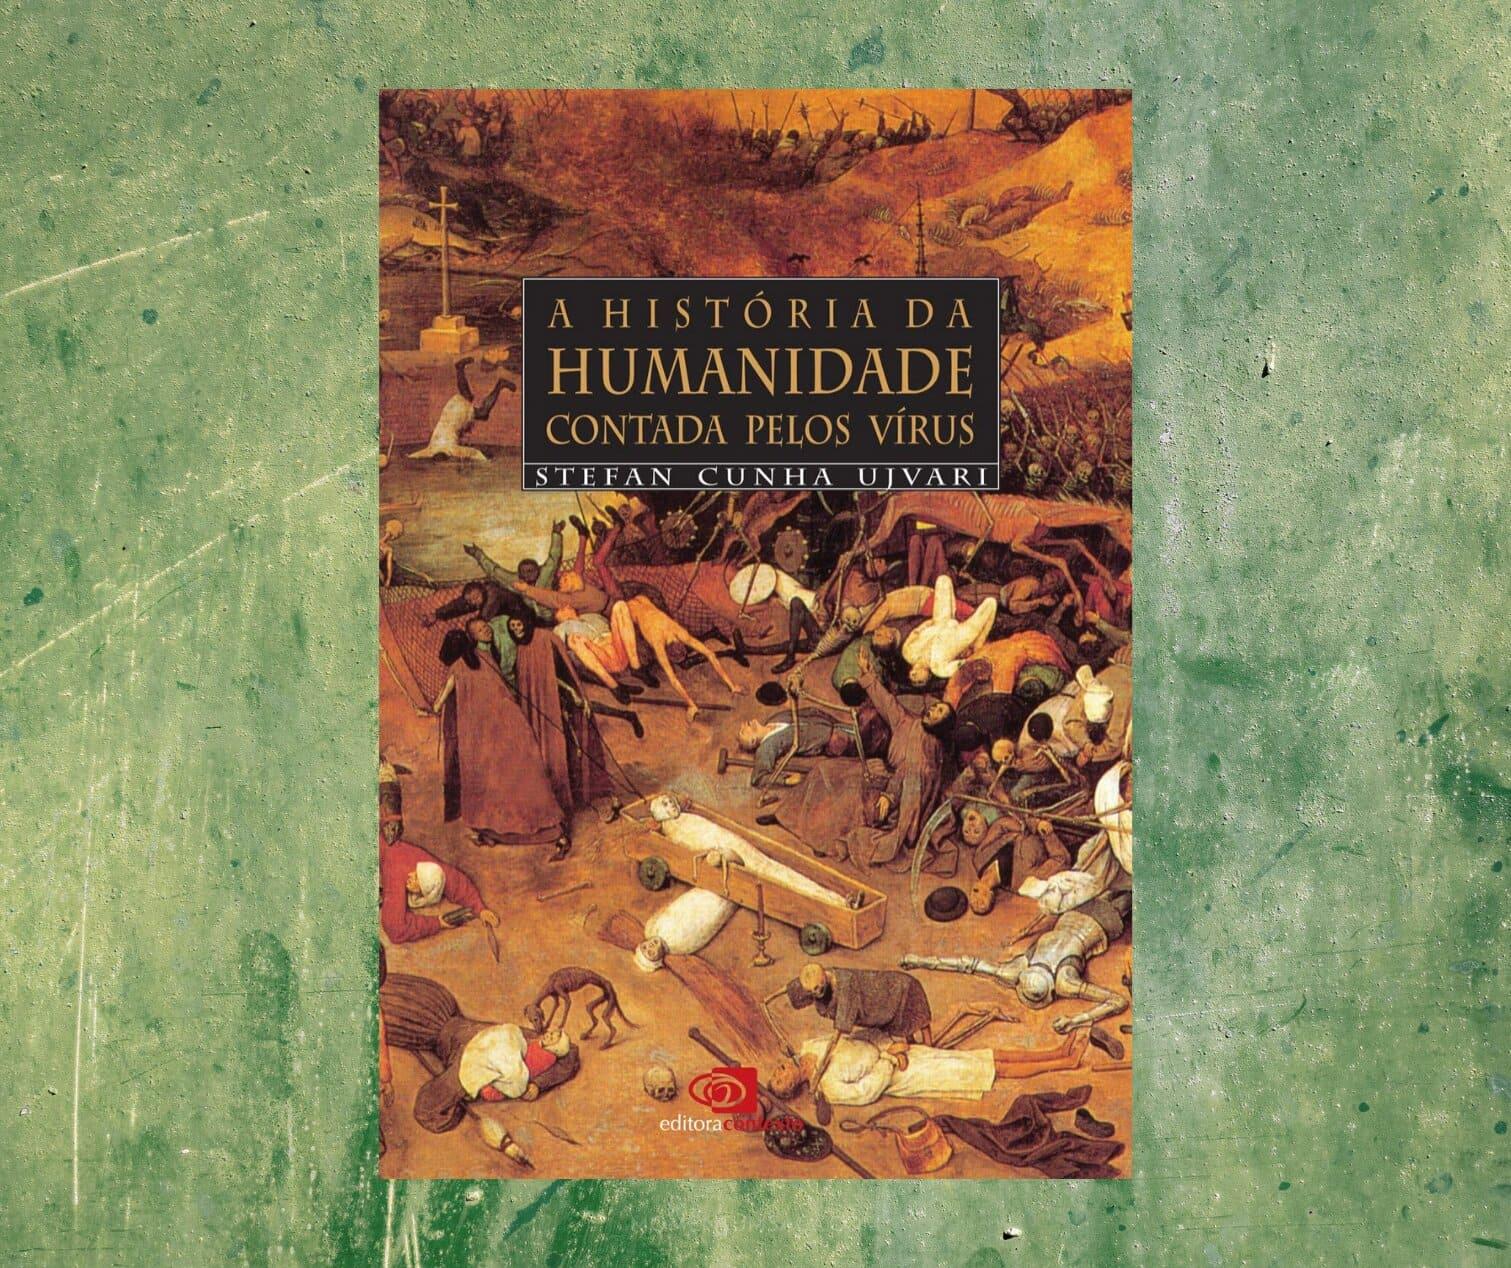 Resenha: A História da Humanidade Contada pelos Vírus, de Stefan Cunha Ujvari